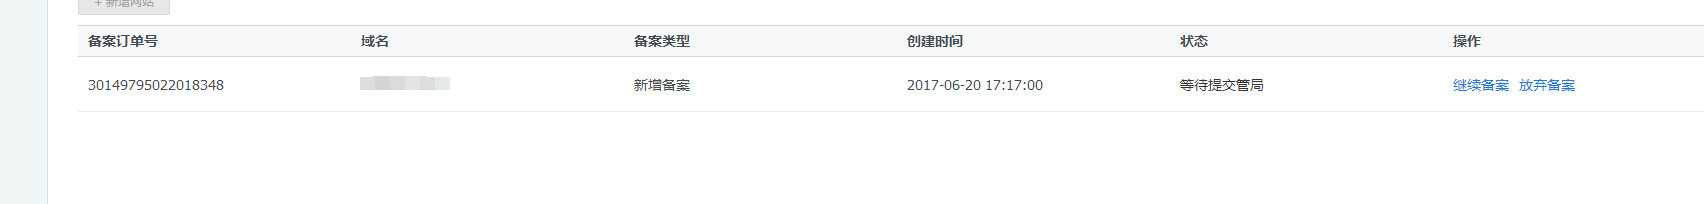 QQ图片20170801104011.png